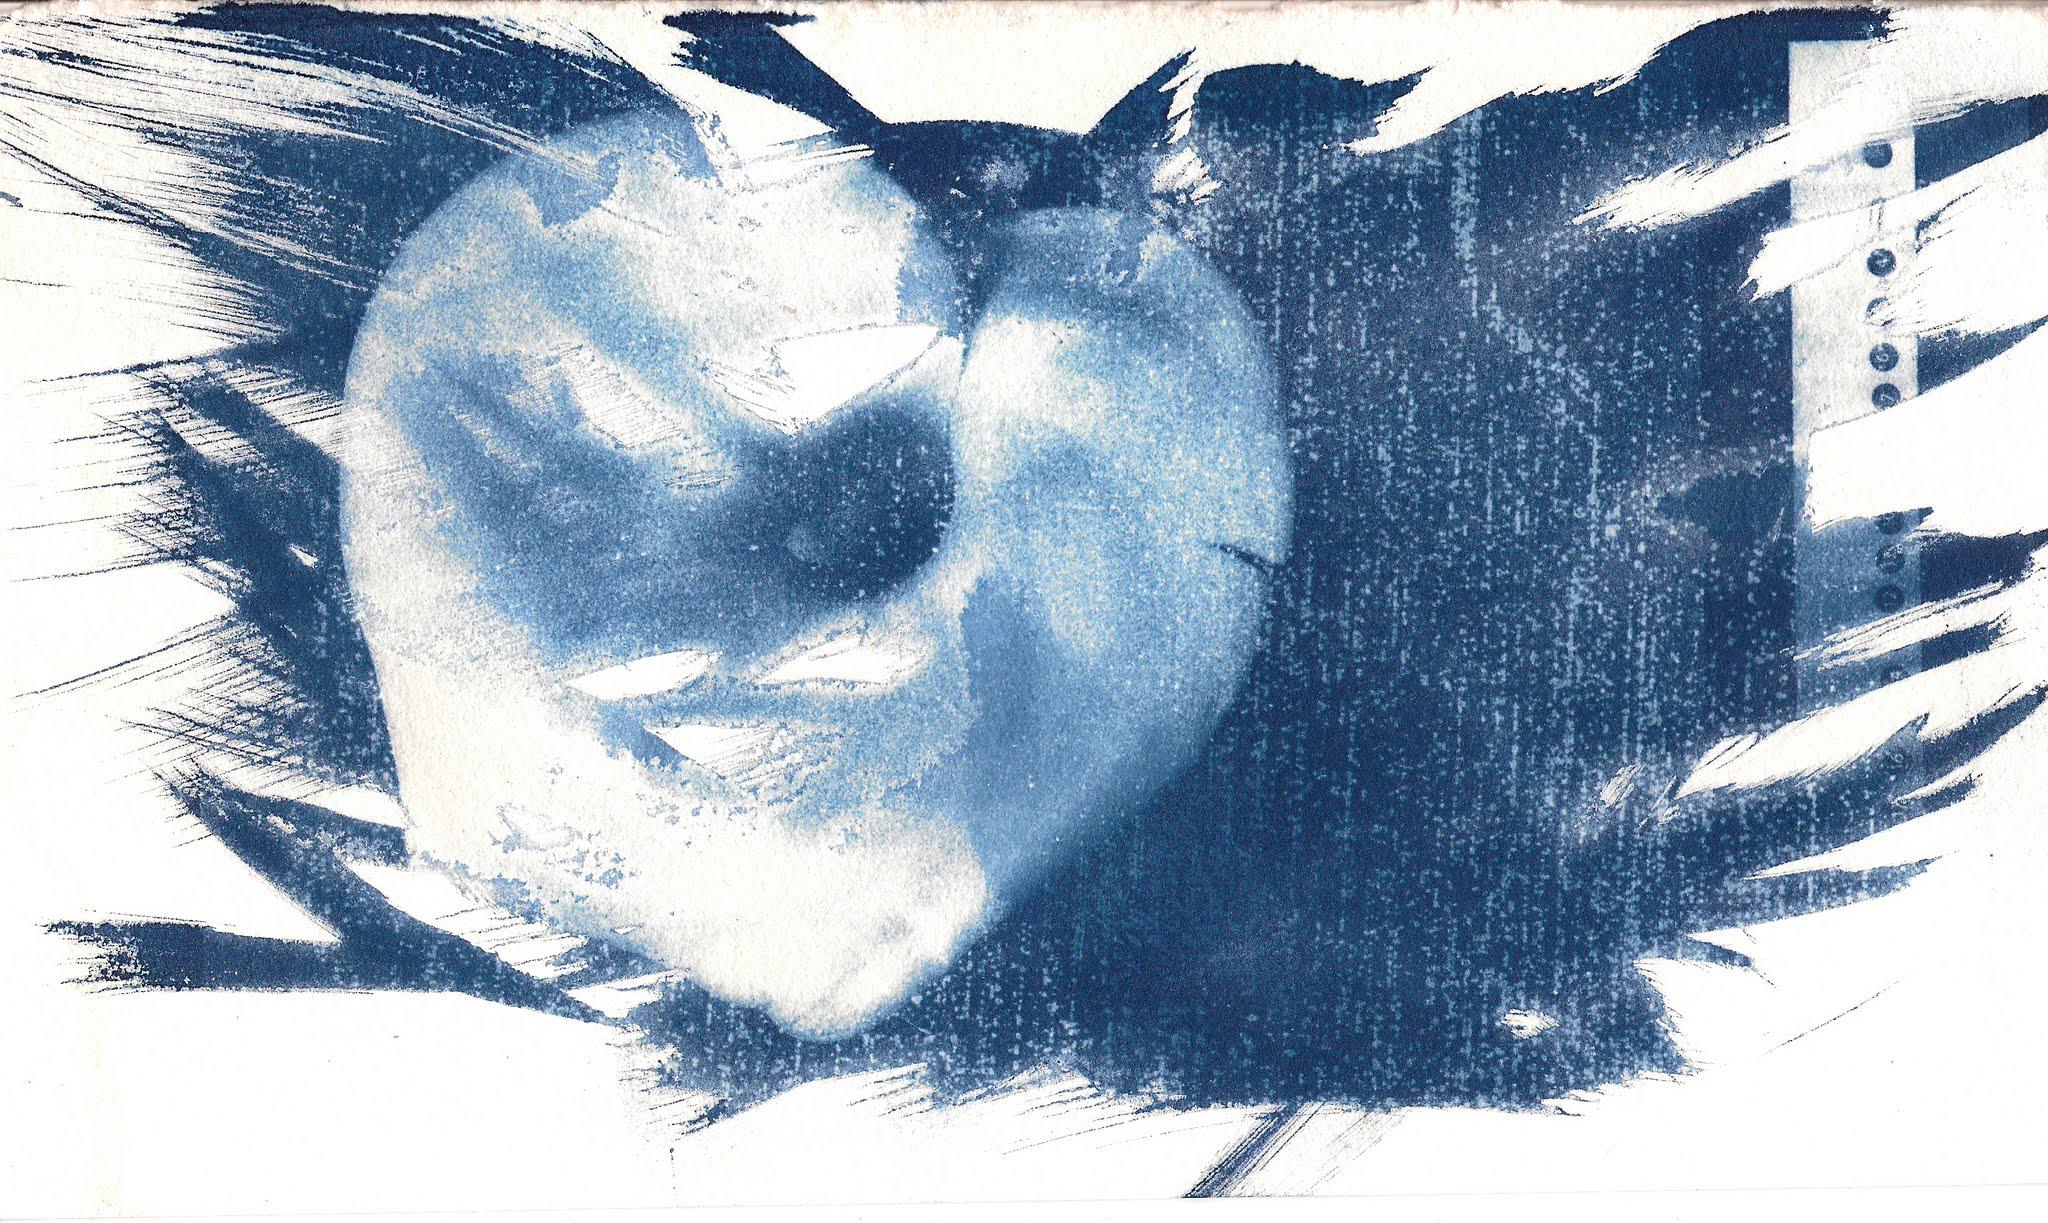 Photo: Cyanotype printed from a damaged negative